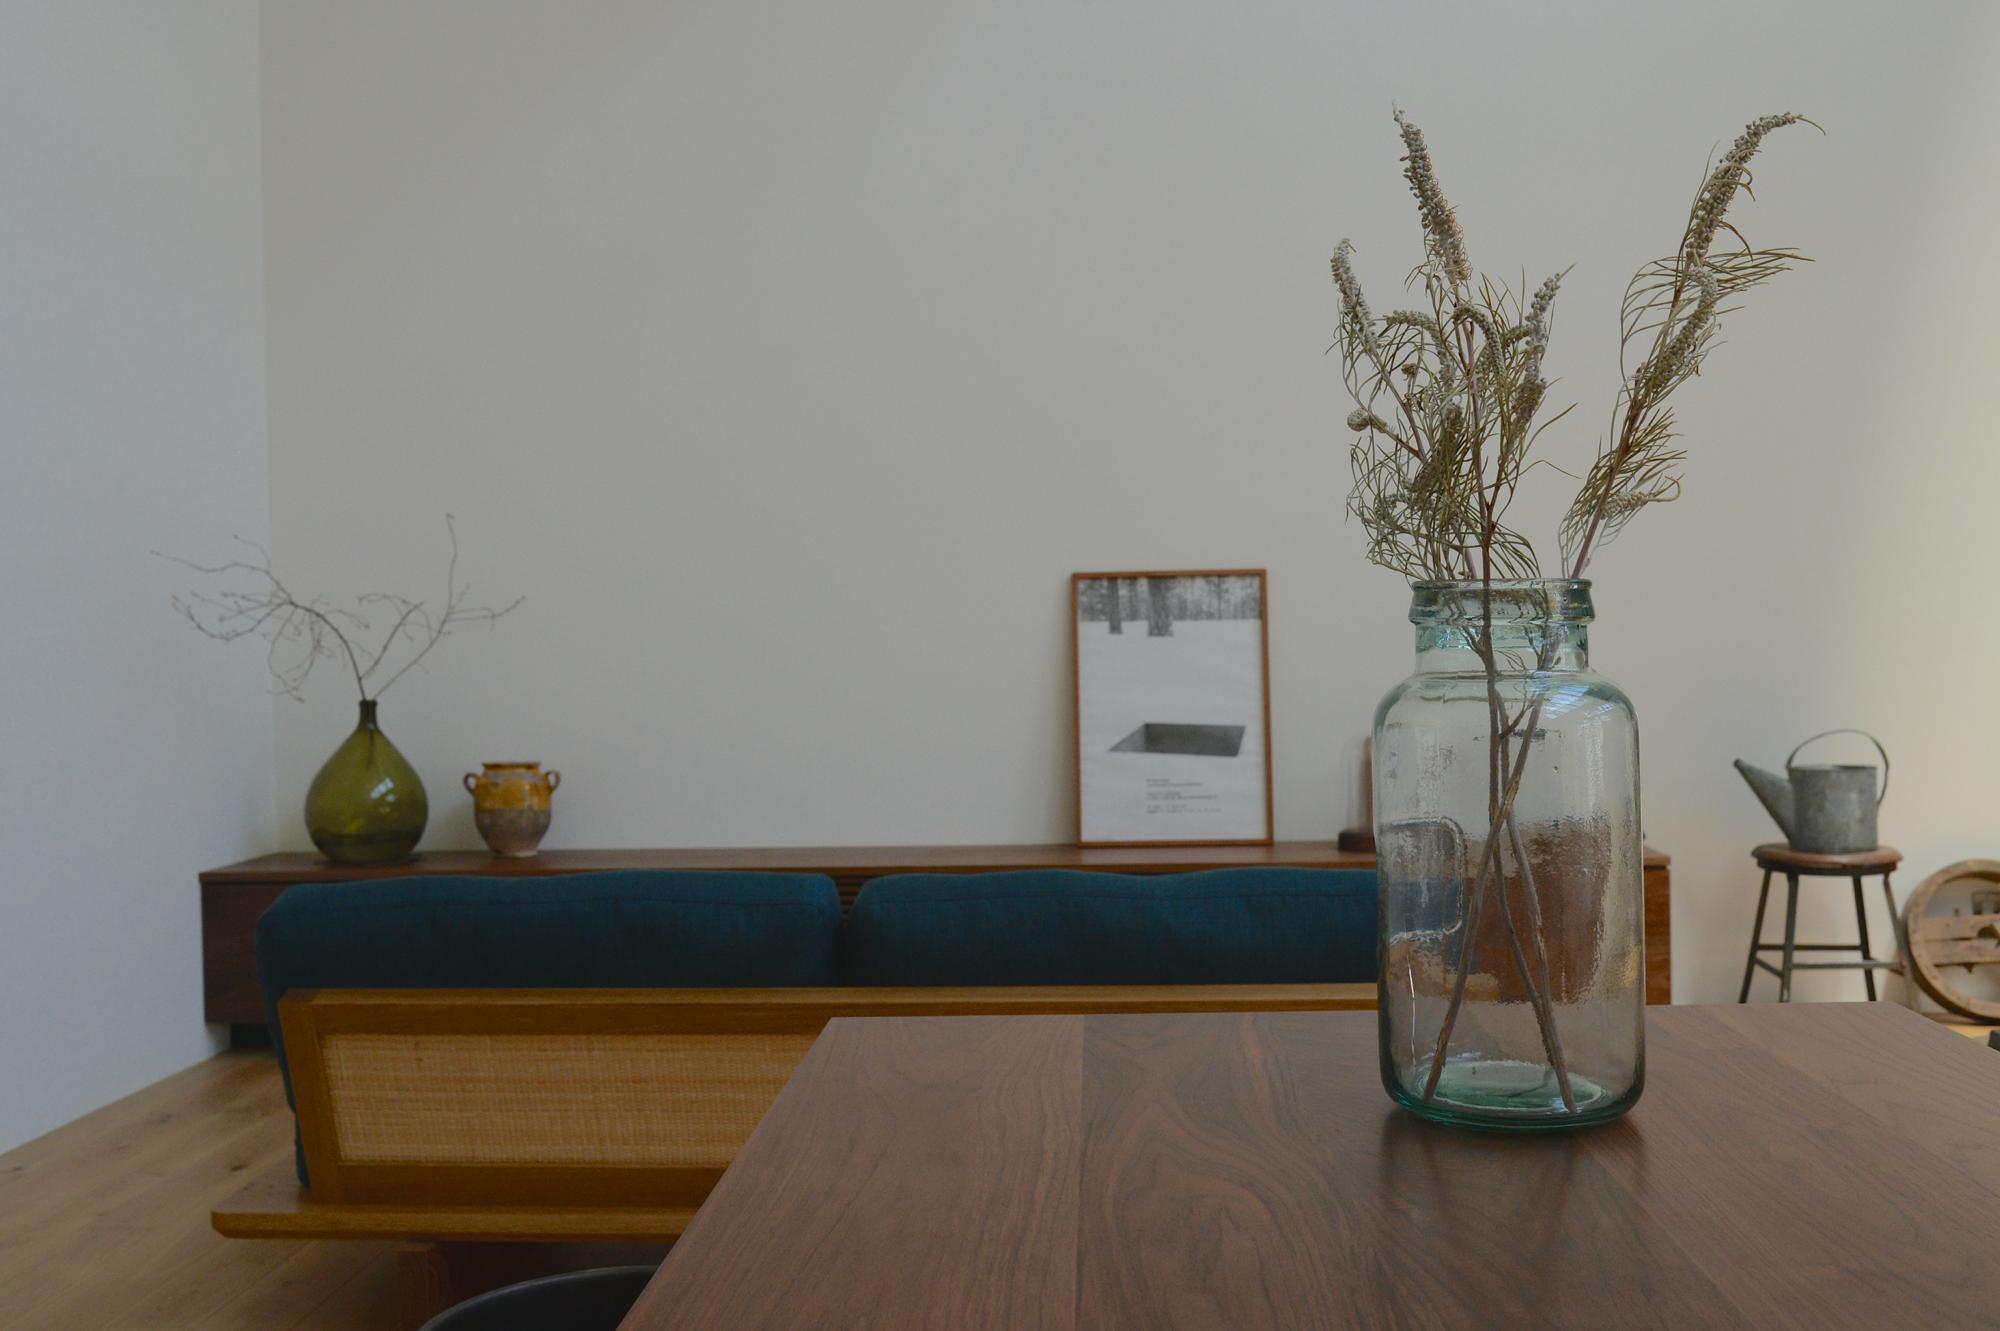 walden ショールーム オーダー家具